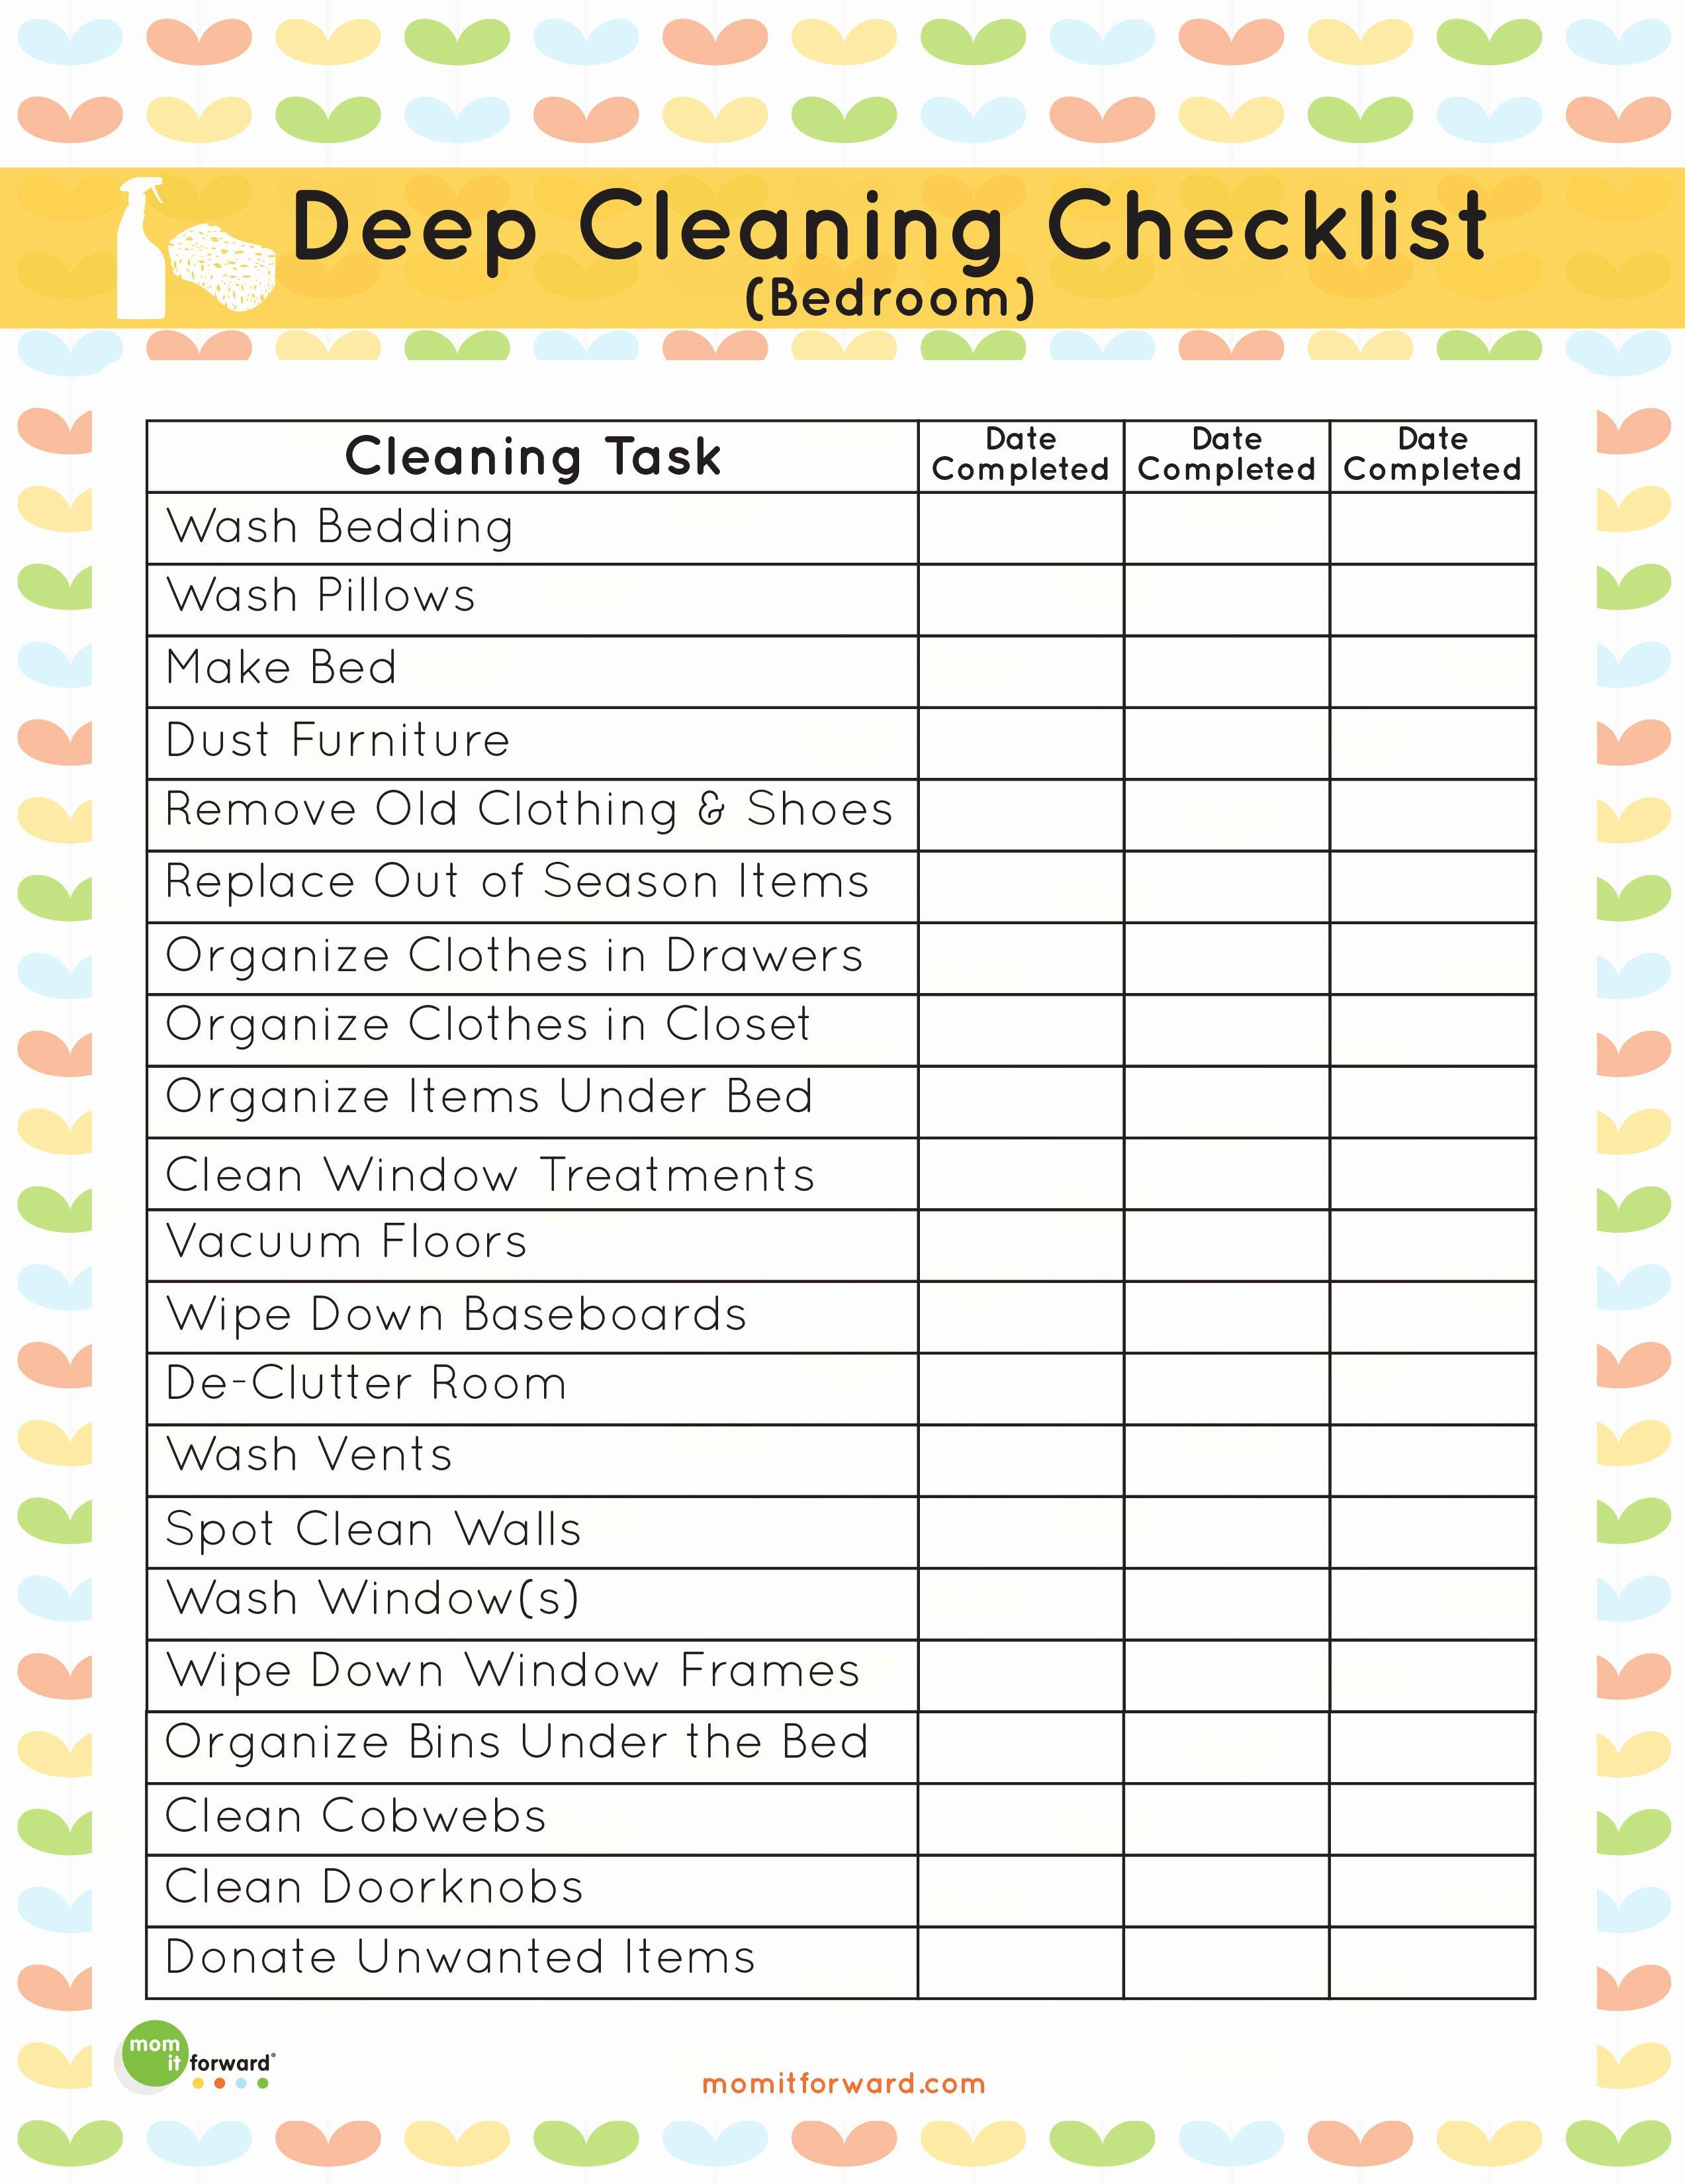 Deep Cleaning Checklist Template Elegant Printable Deep Cleaning Bedroom Checklist Mom It